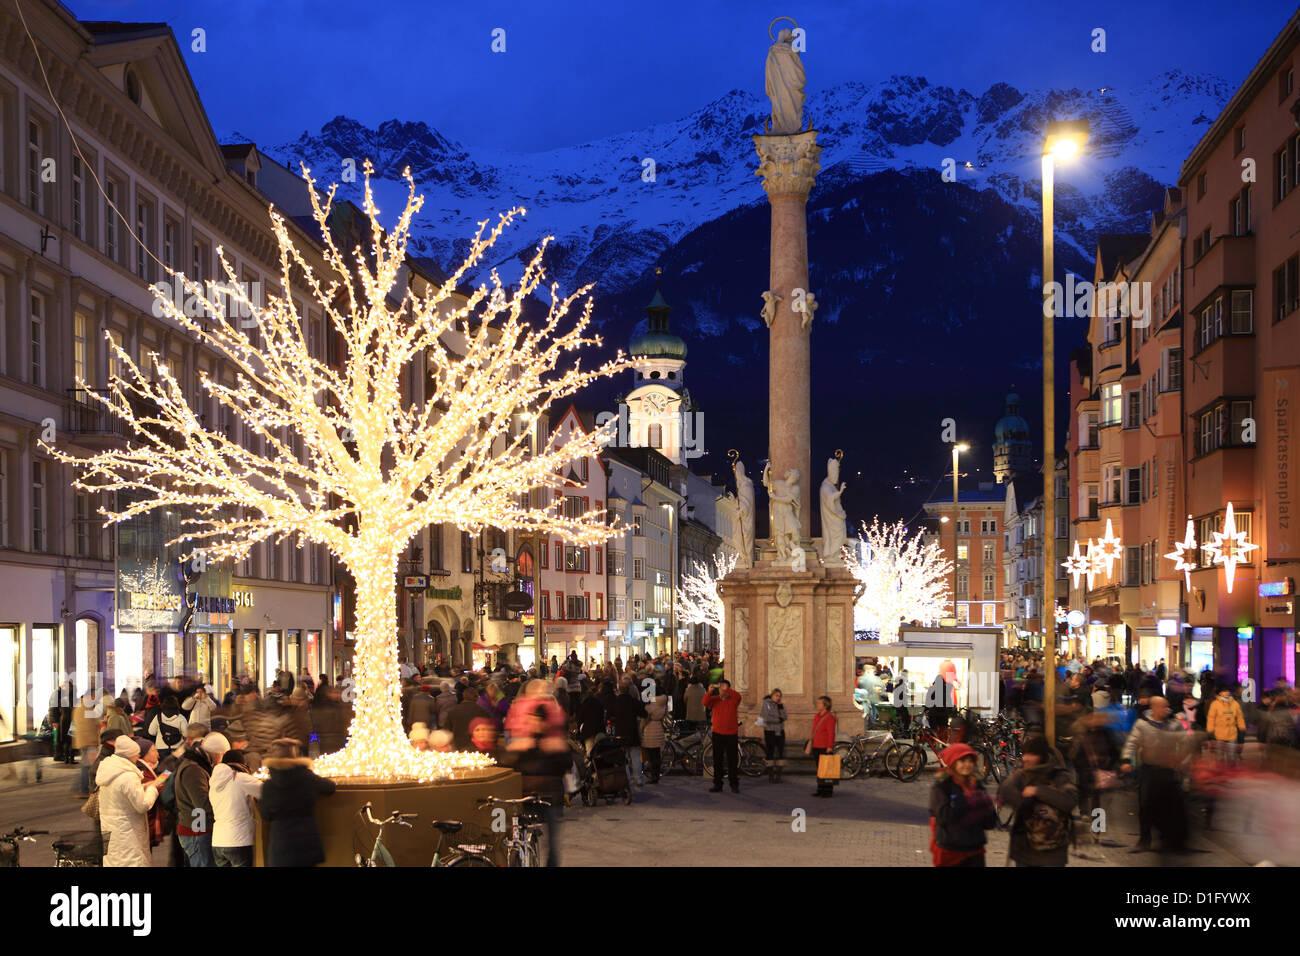 Christmas tree at dusk, Innsbruck, Tyrol, Austria, Europe - Stock Image